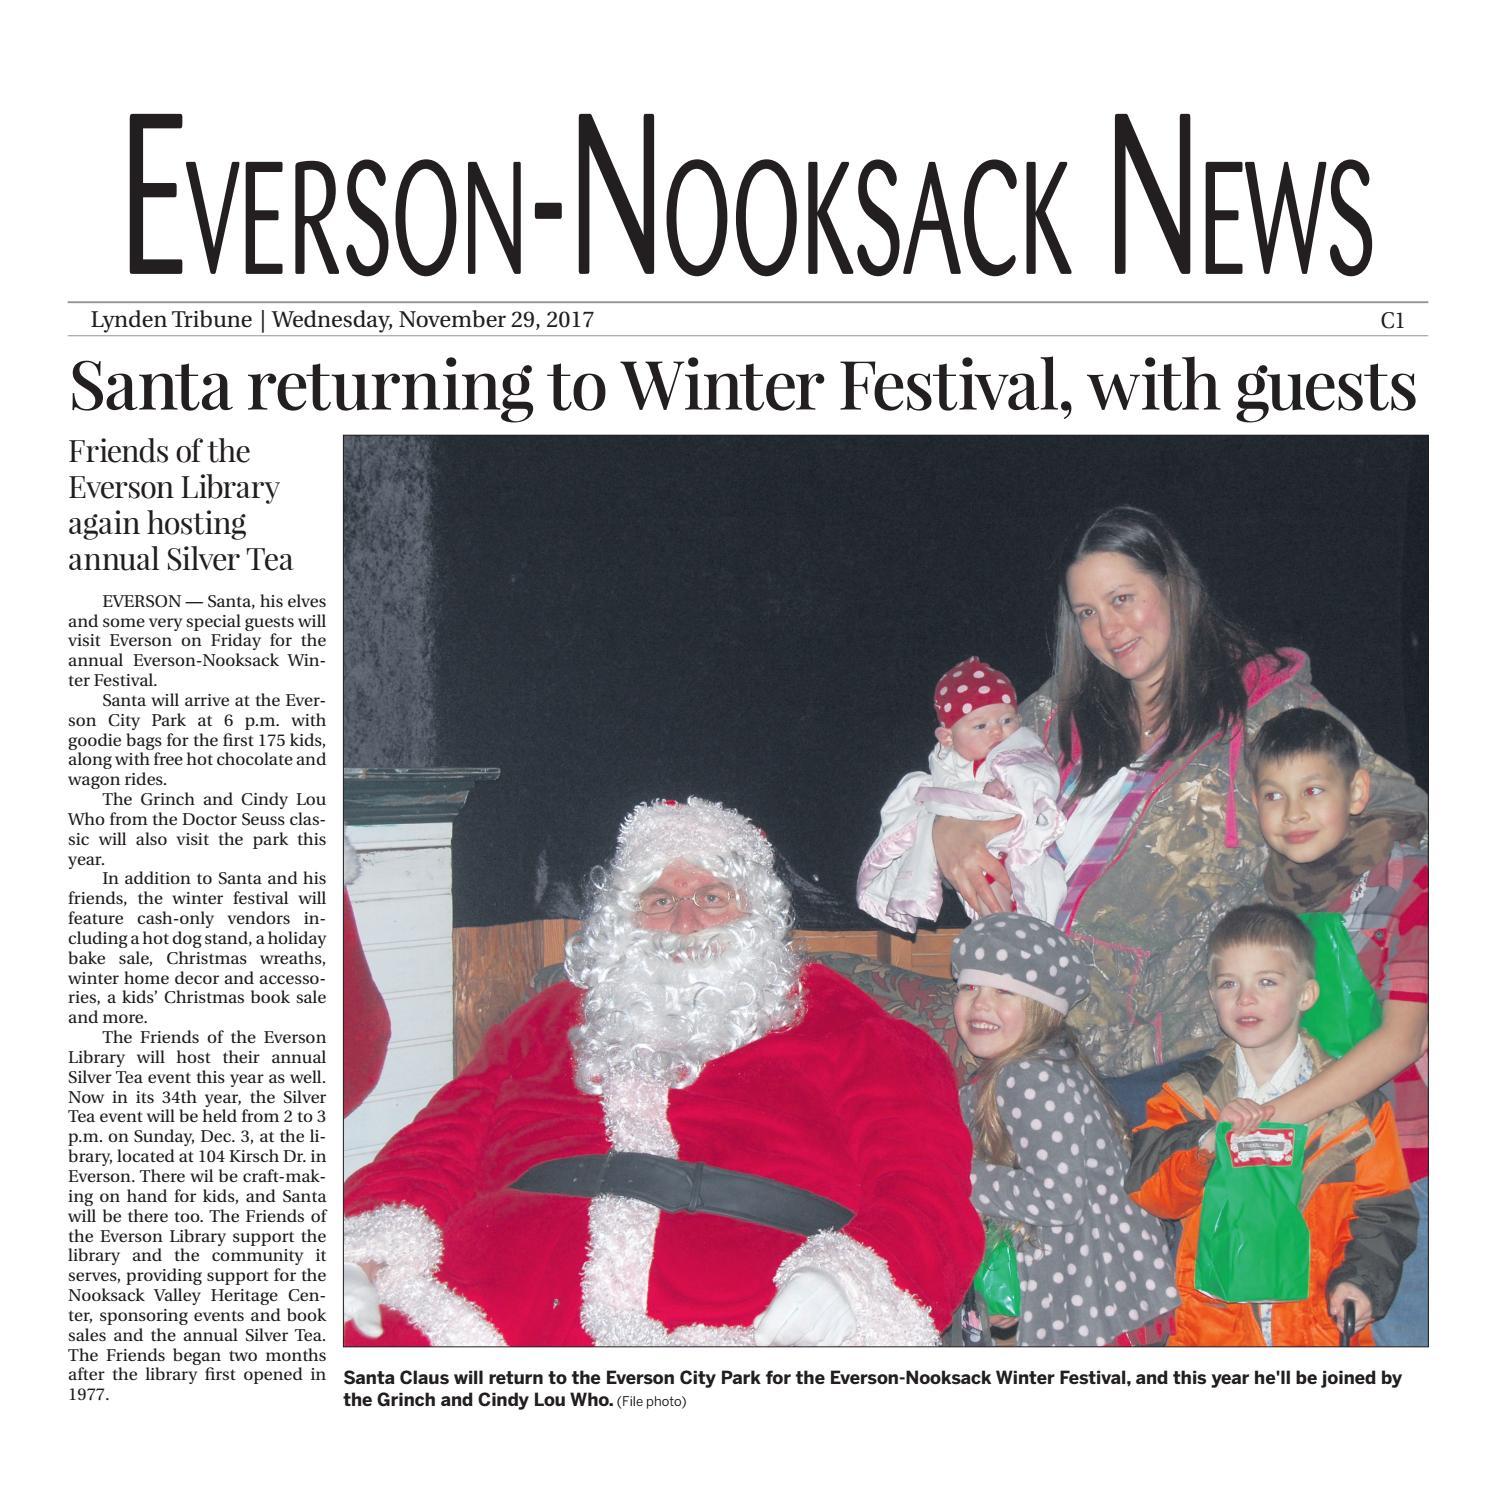 Everson Nooksack News November 2017 By Lynden Tribune